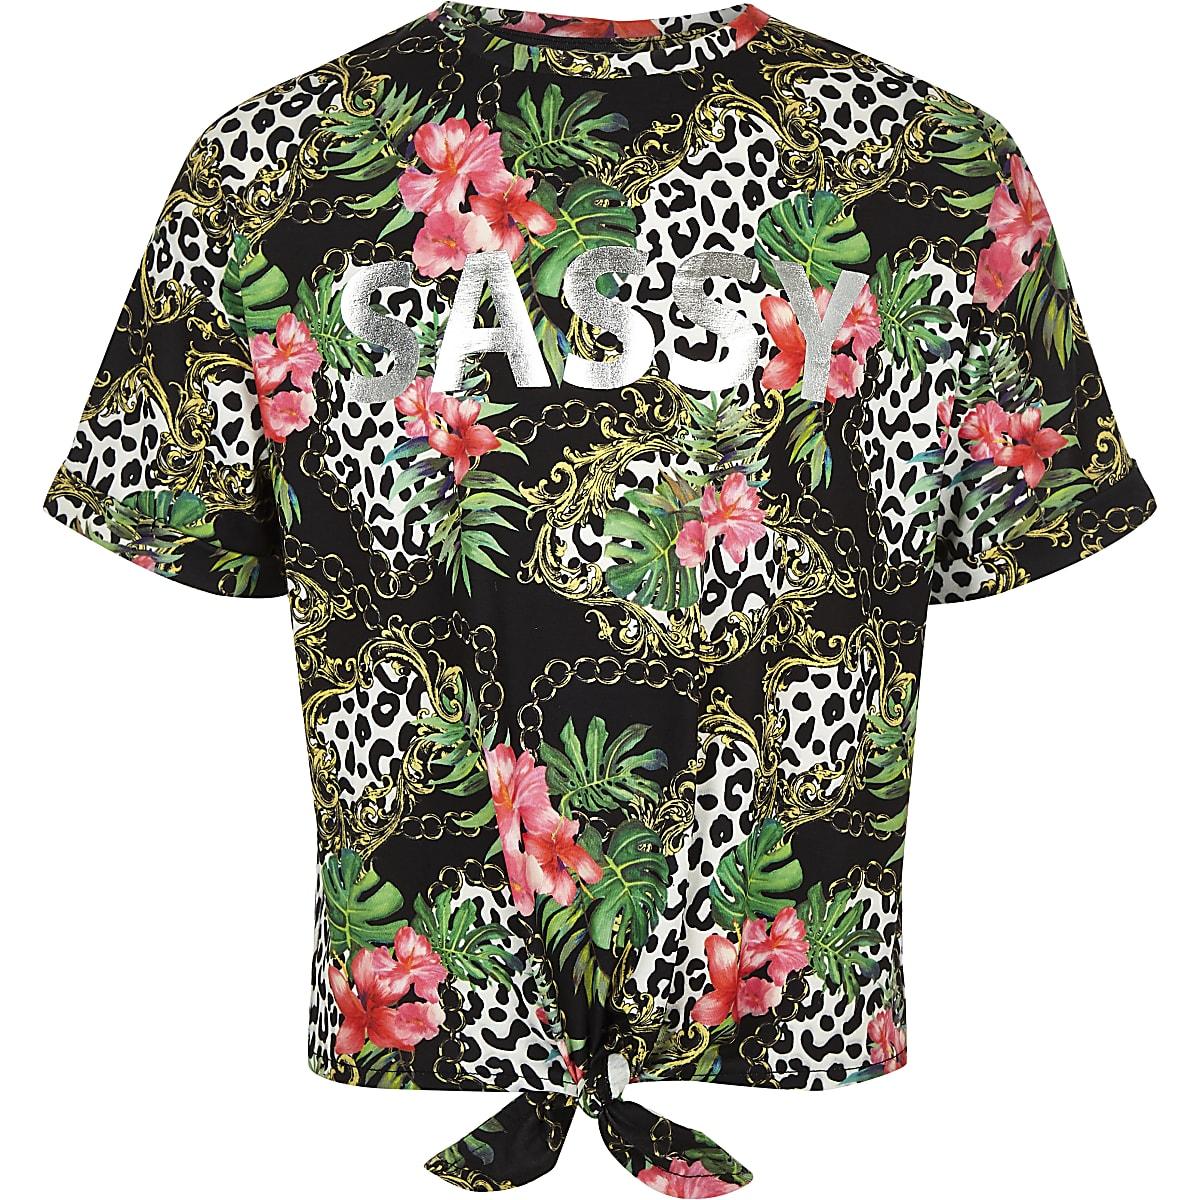 Girls black chain print 'Sassy' T-shirt